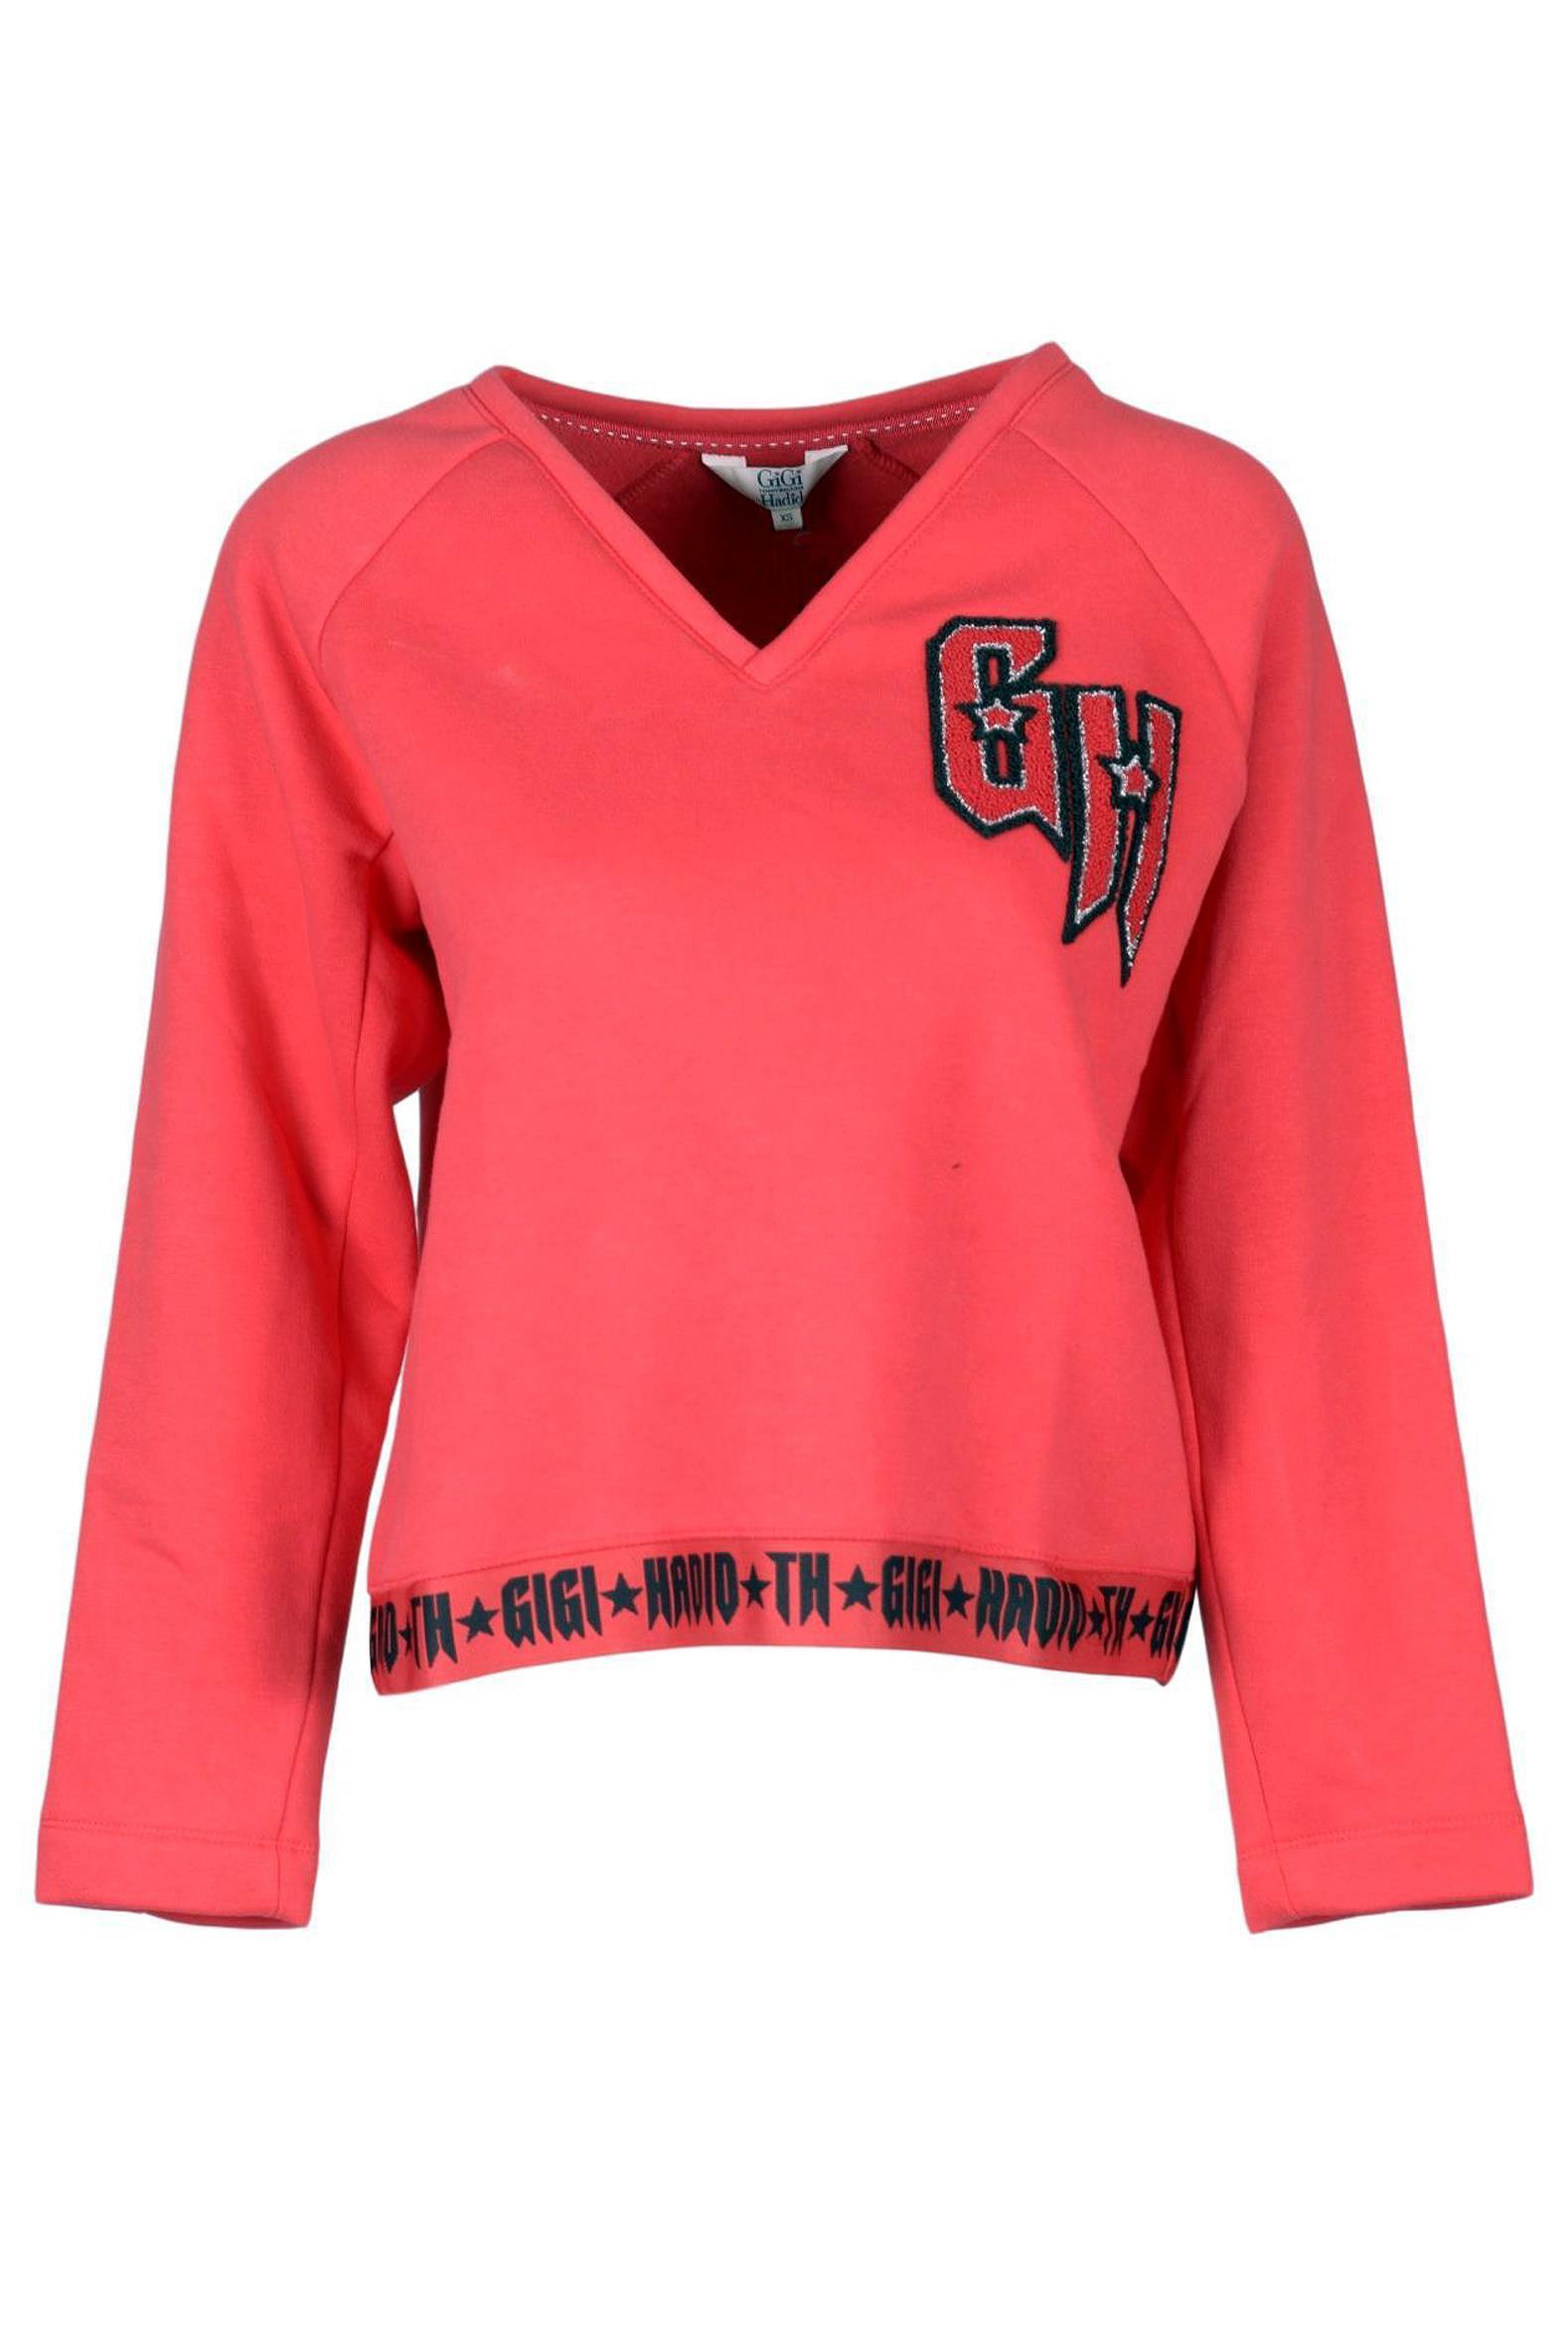 17494e91 Lyst - Tommy Hilfiger X Gigi Hadid Logo Sweater in Red